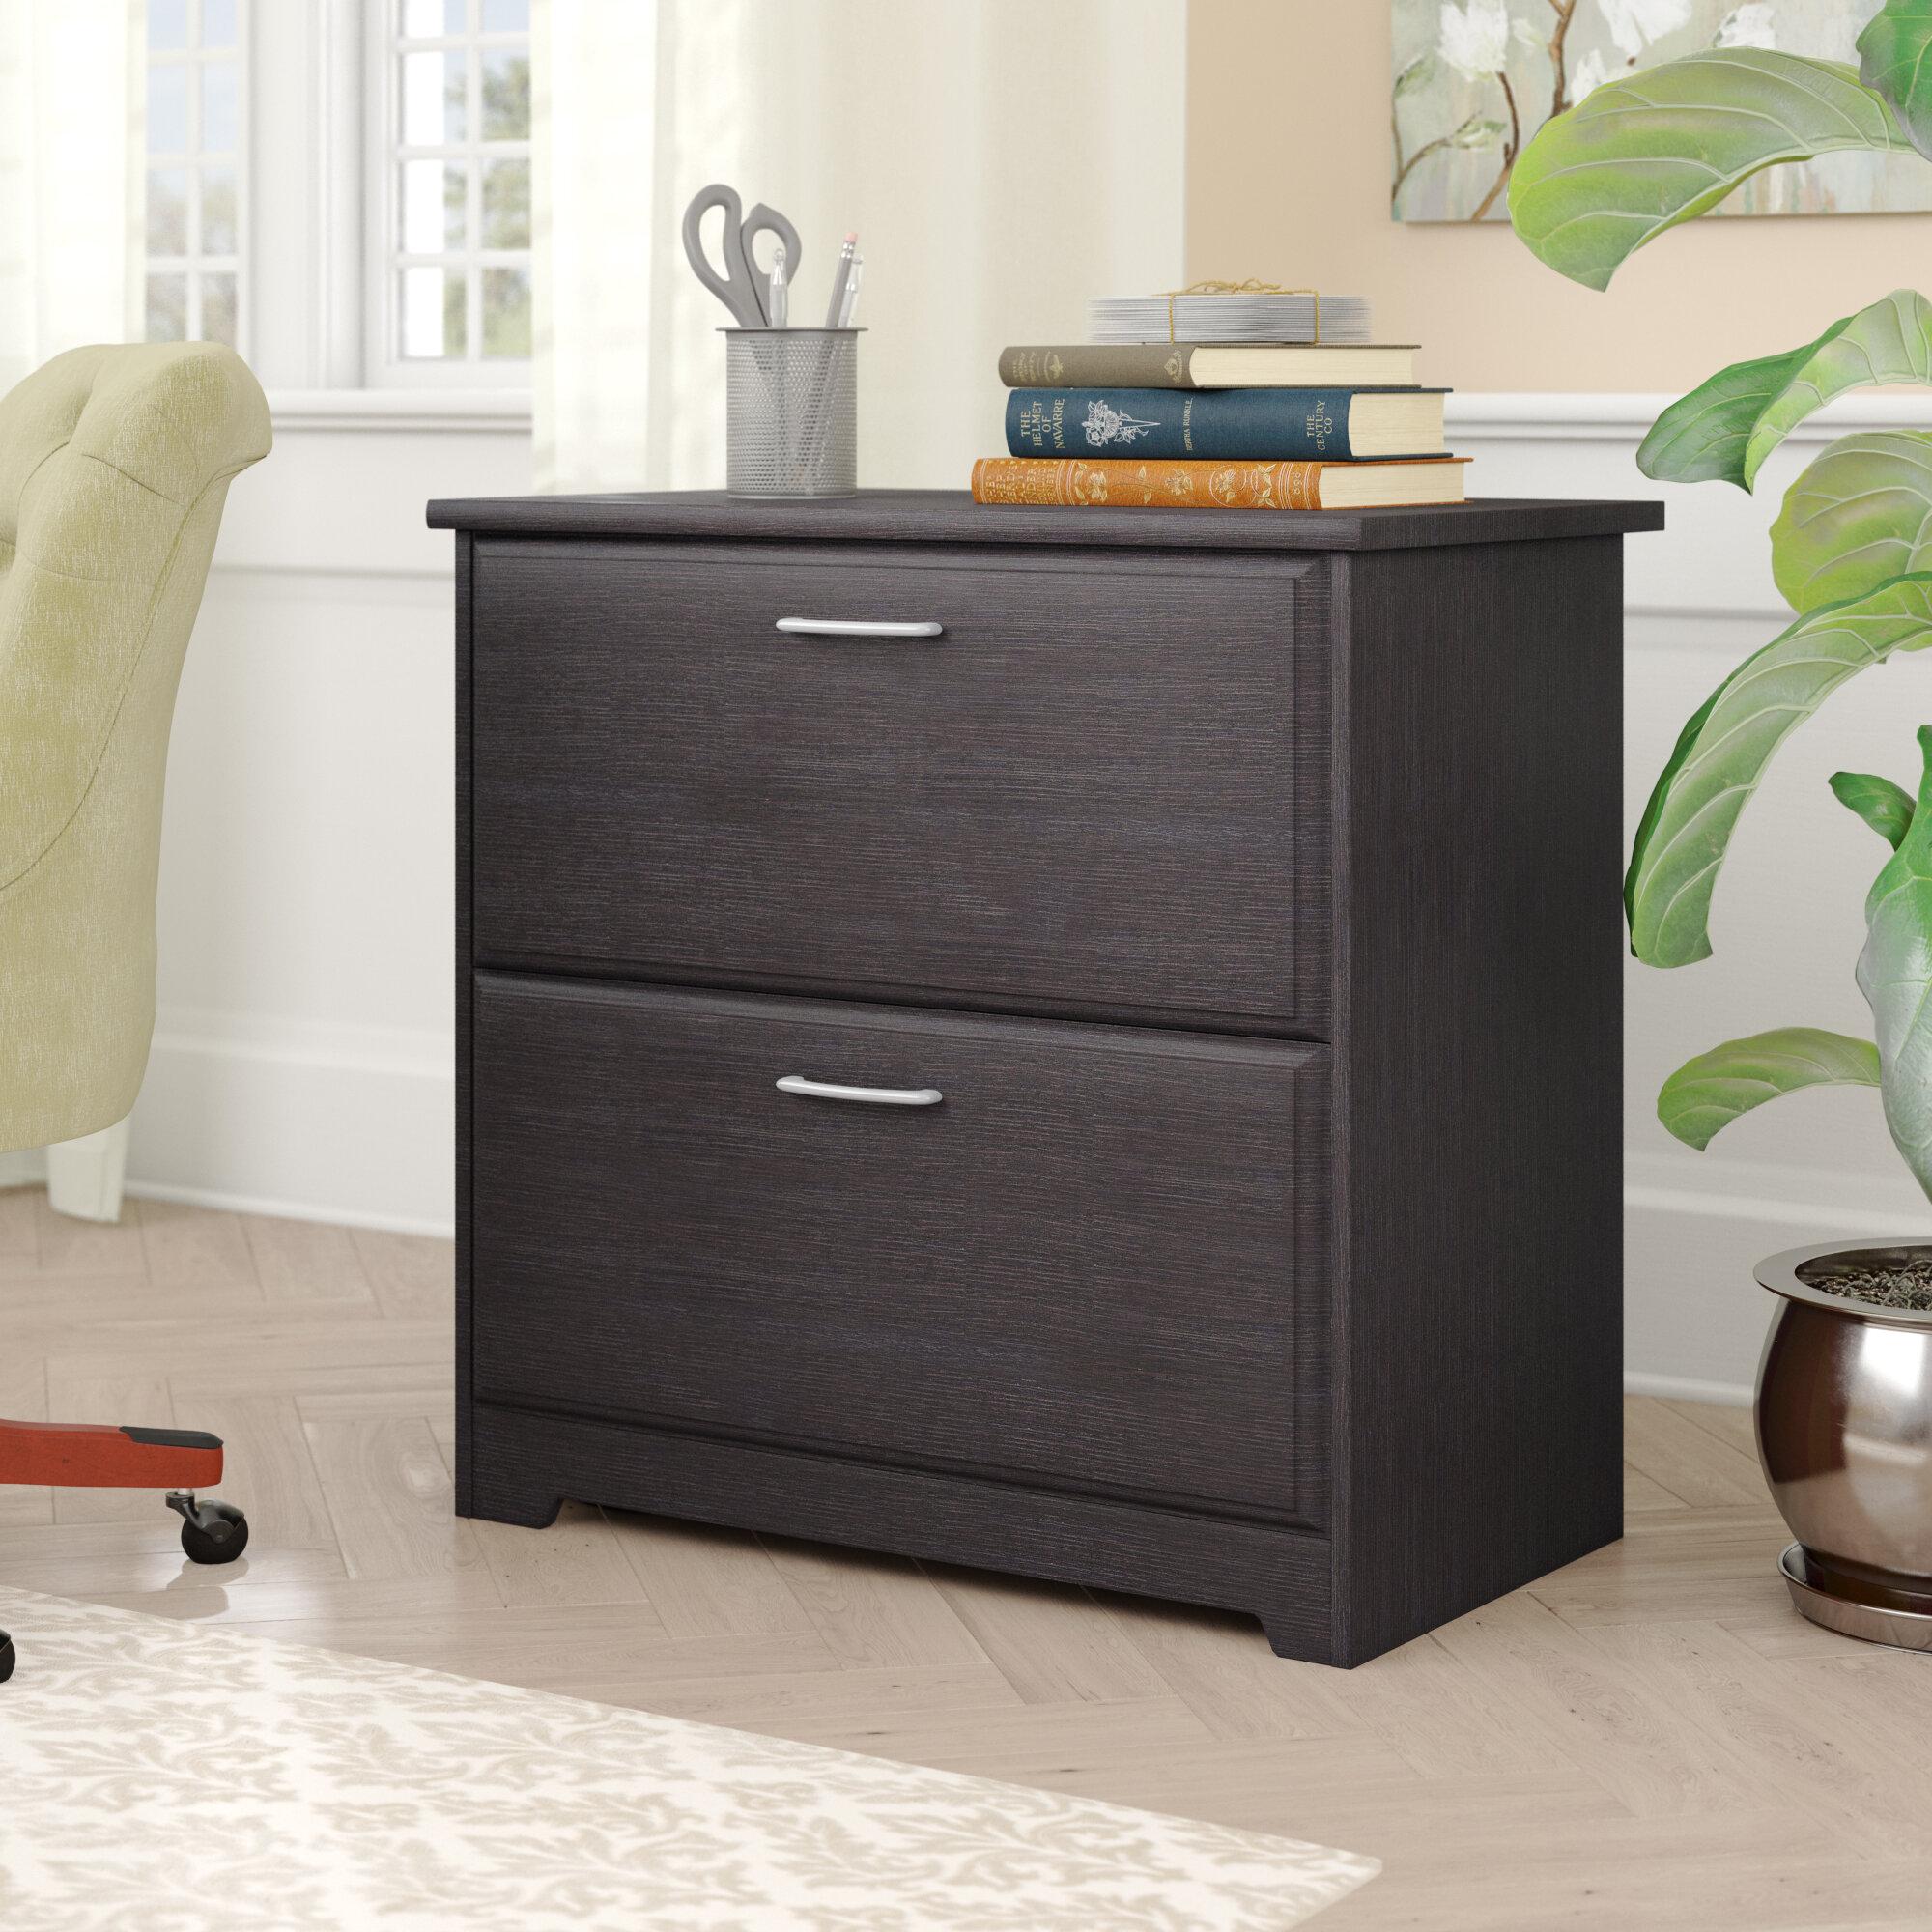 Red Barrel Studio Hillsdale 2 Drawer Lateral Filing Cabinet Reviews Wayfair